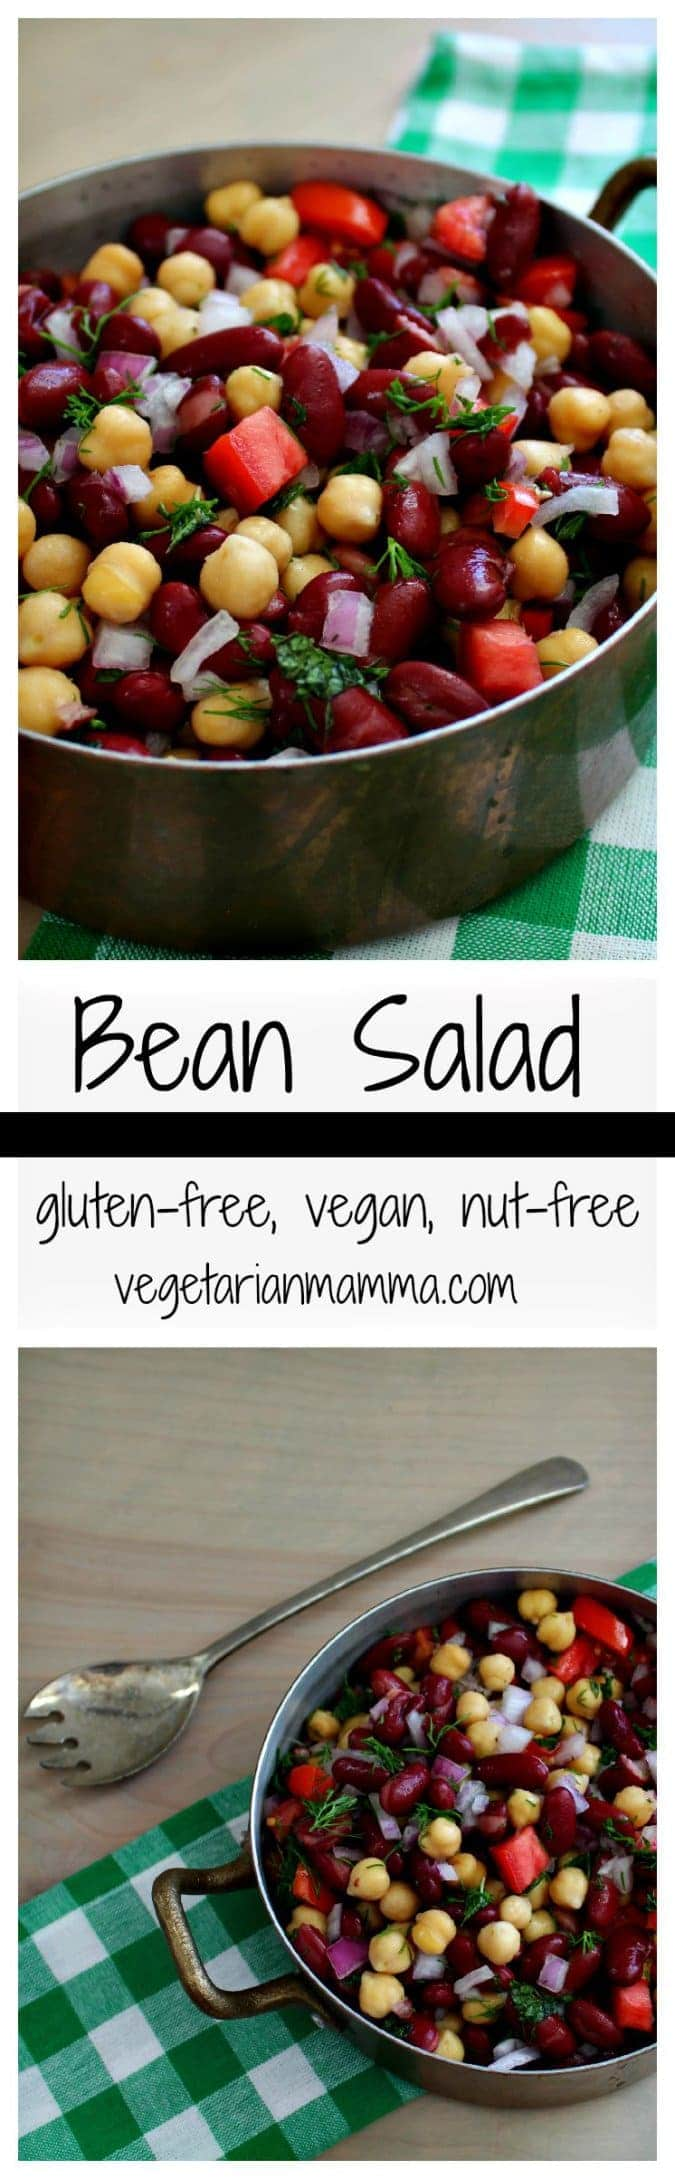 Bean Salad - #glutenfree #nutfree #vegan #salad #beans @vegetarianmamma.com